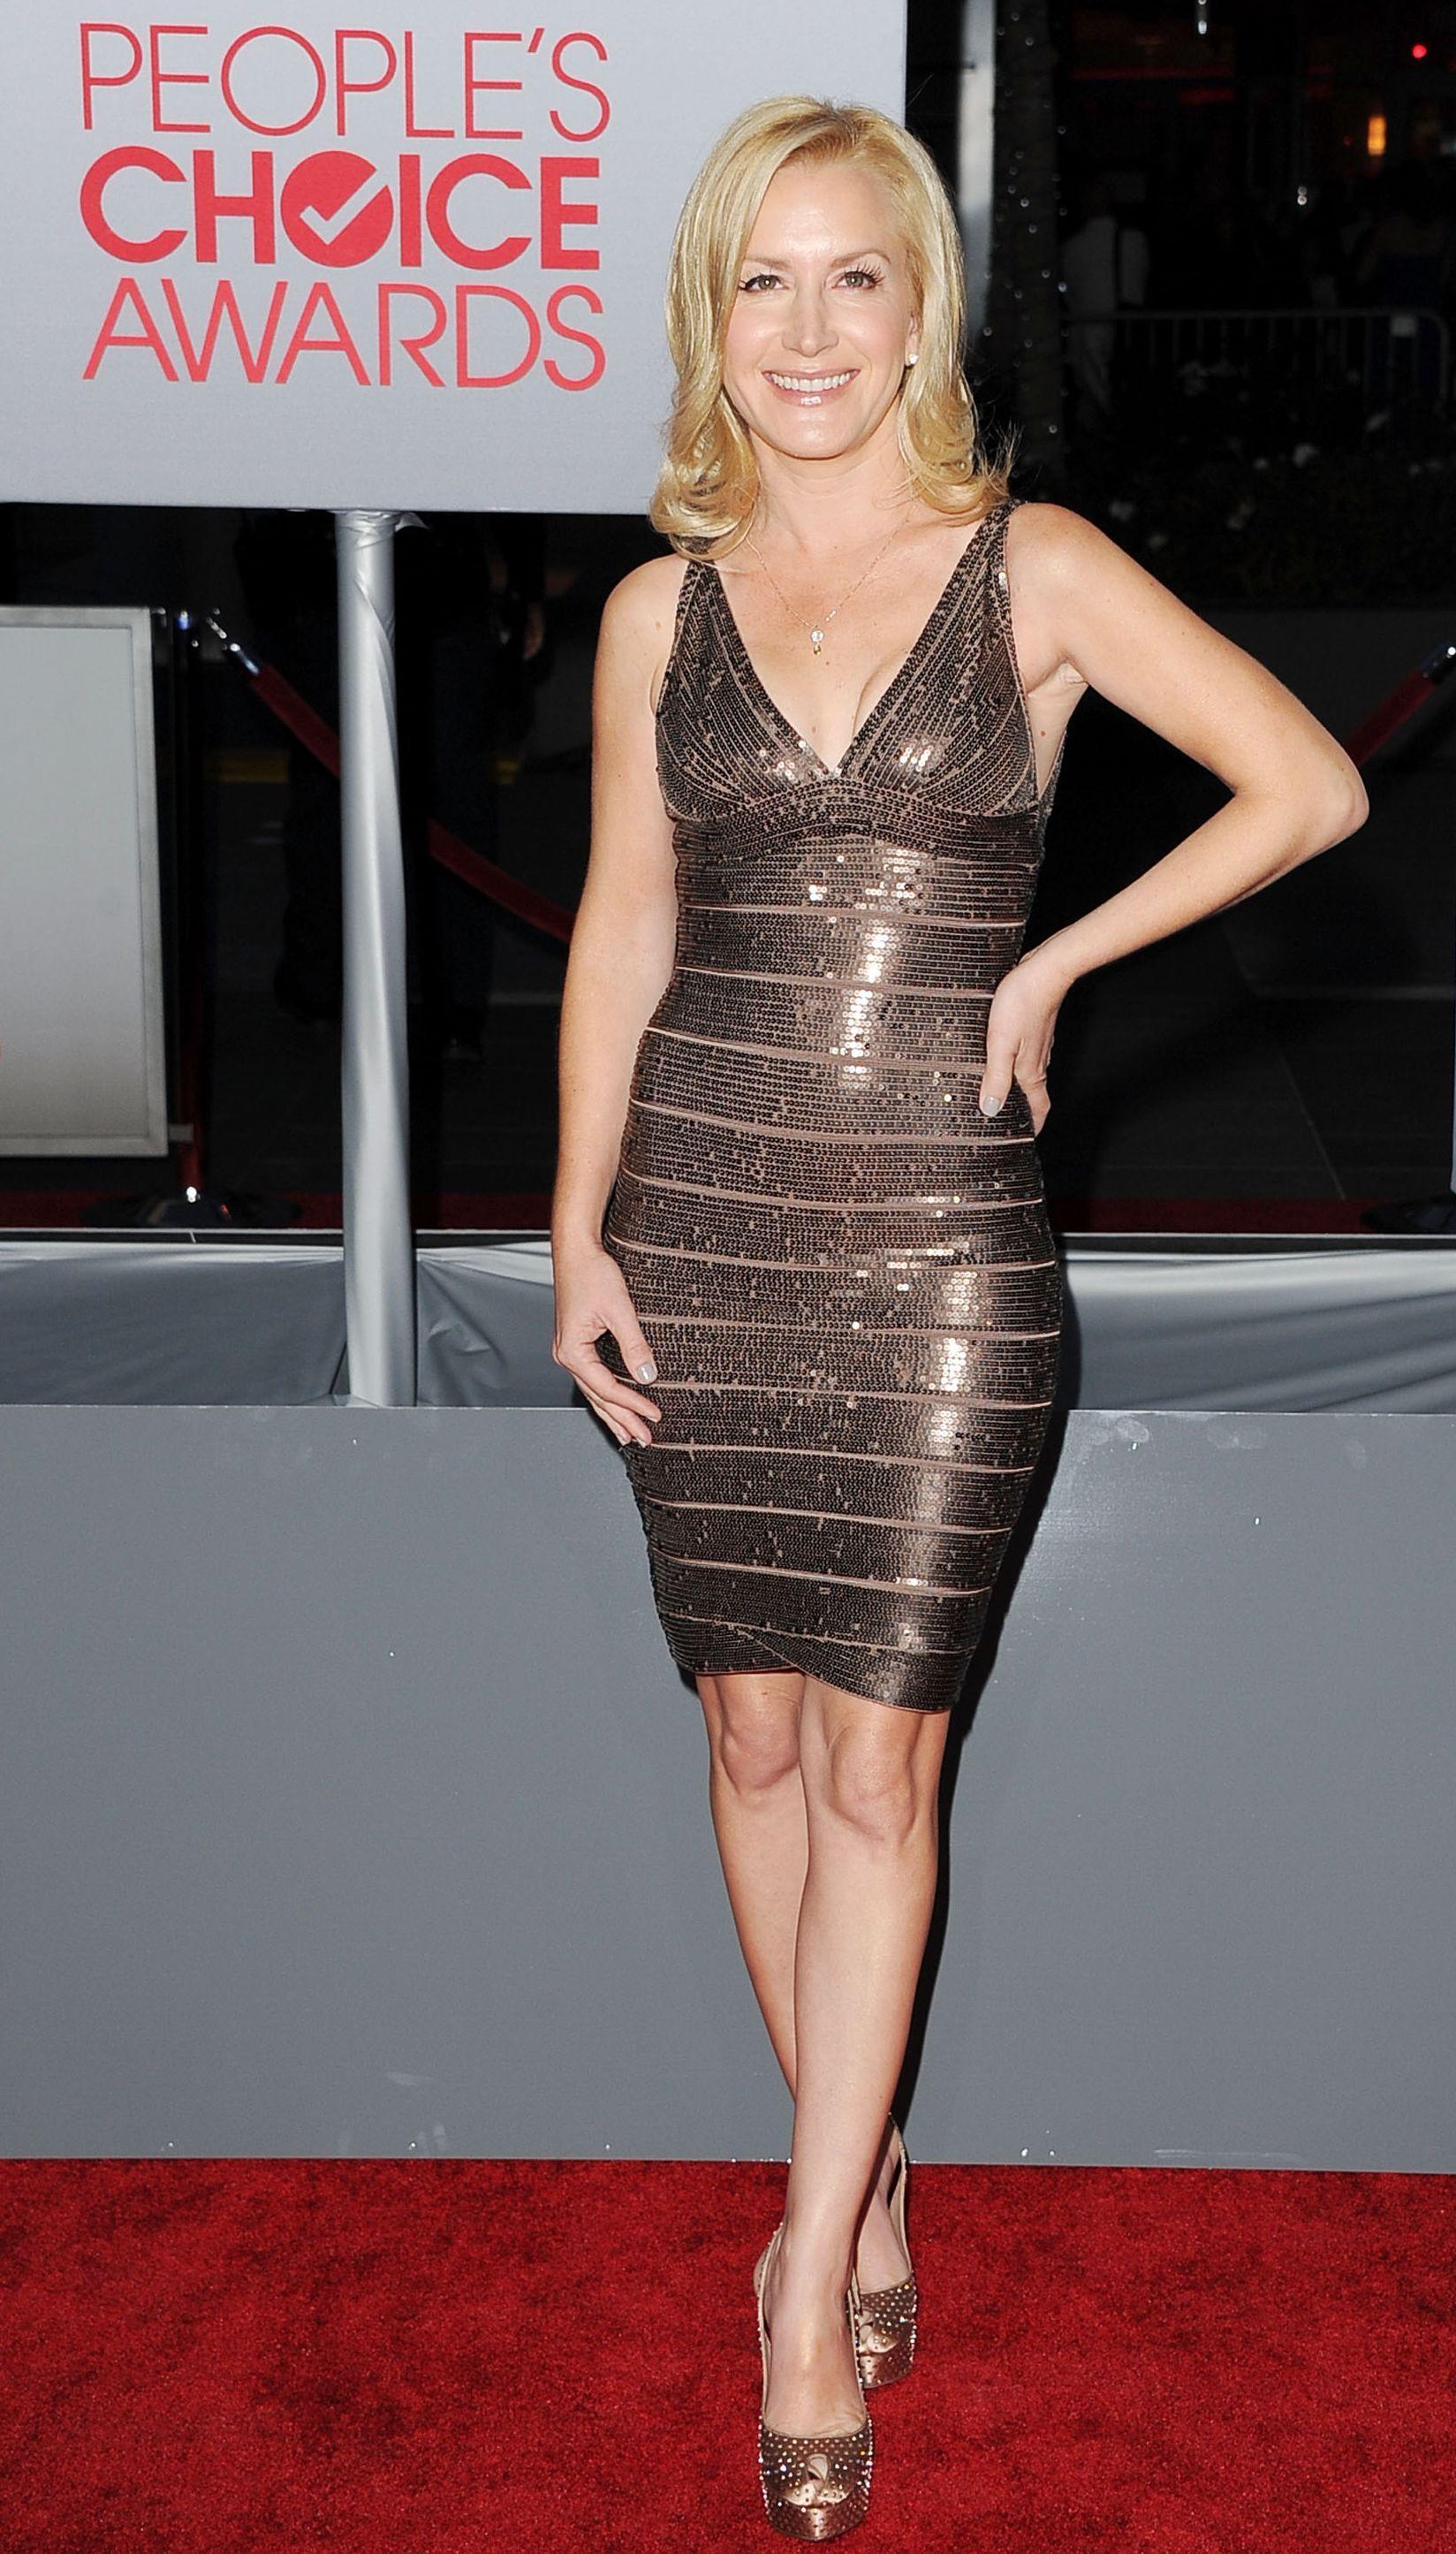 Angela Kinsey Nude angela kinsey wearing a metallic herve leger dress | herve